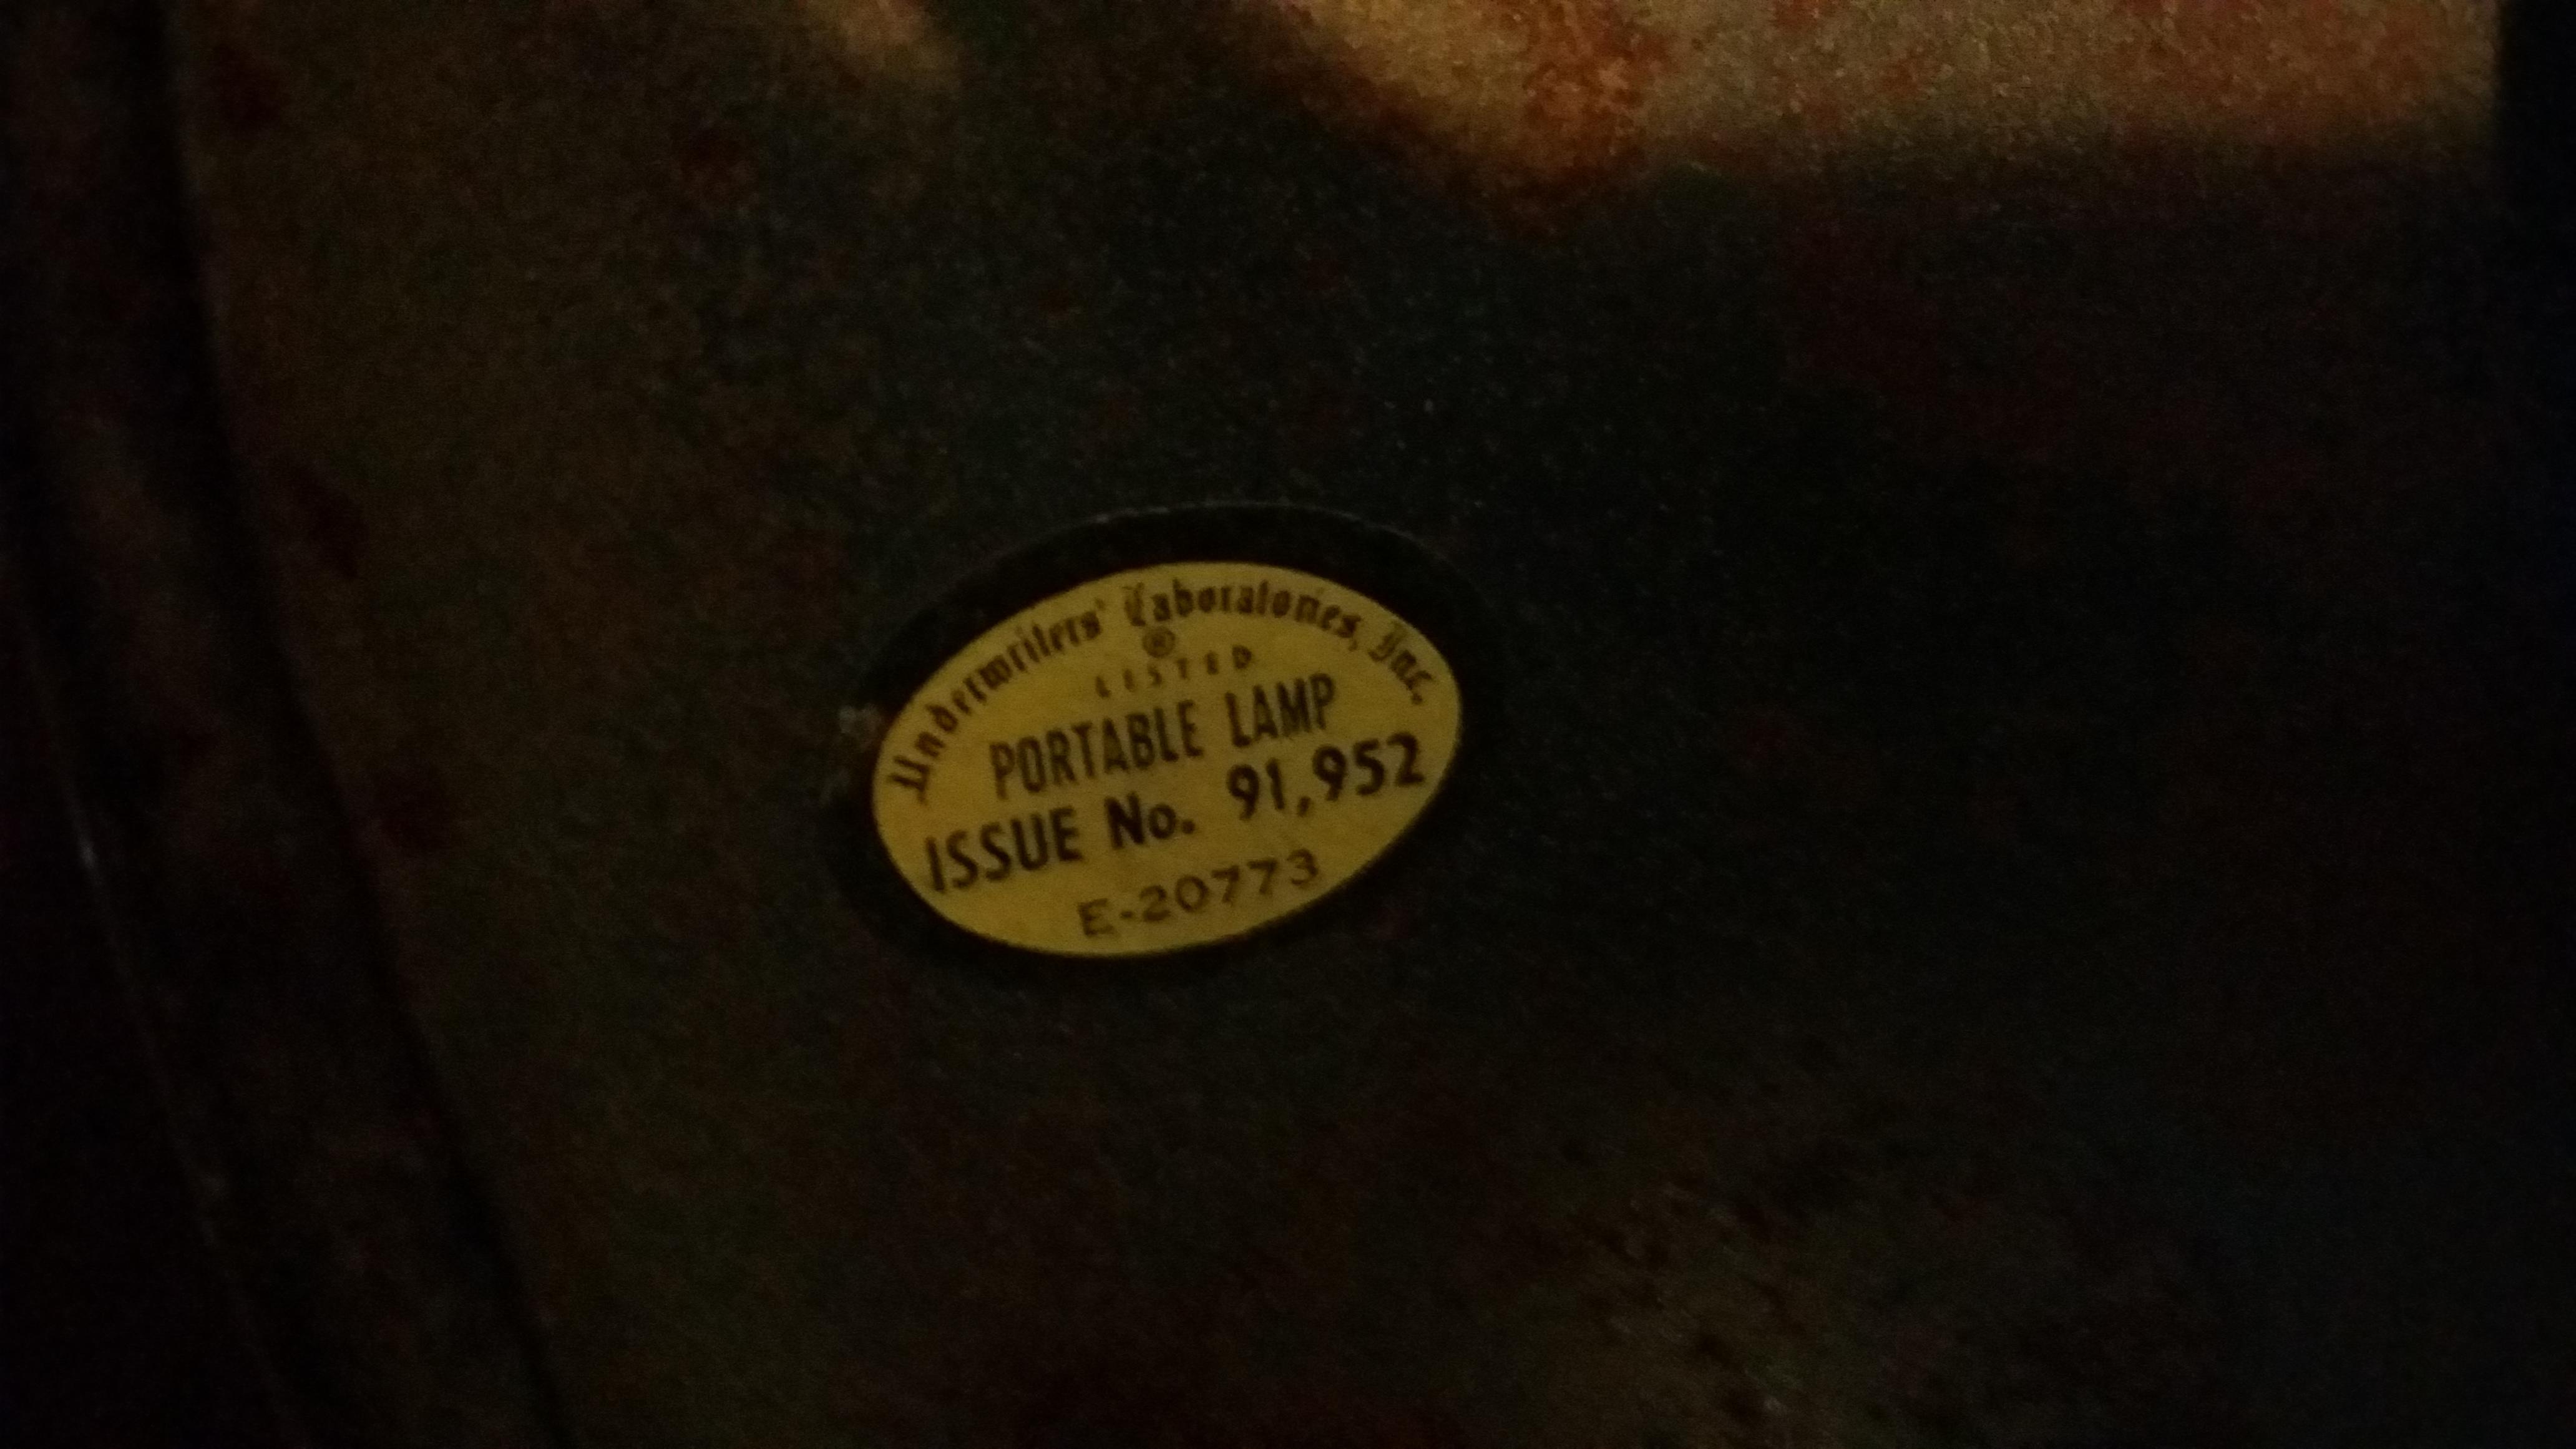 vintage portable lamp antique appraisal | InstAppraisal